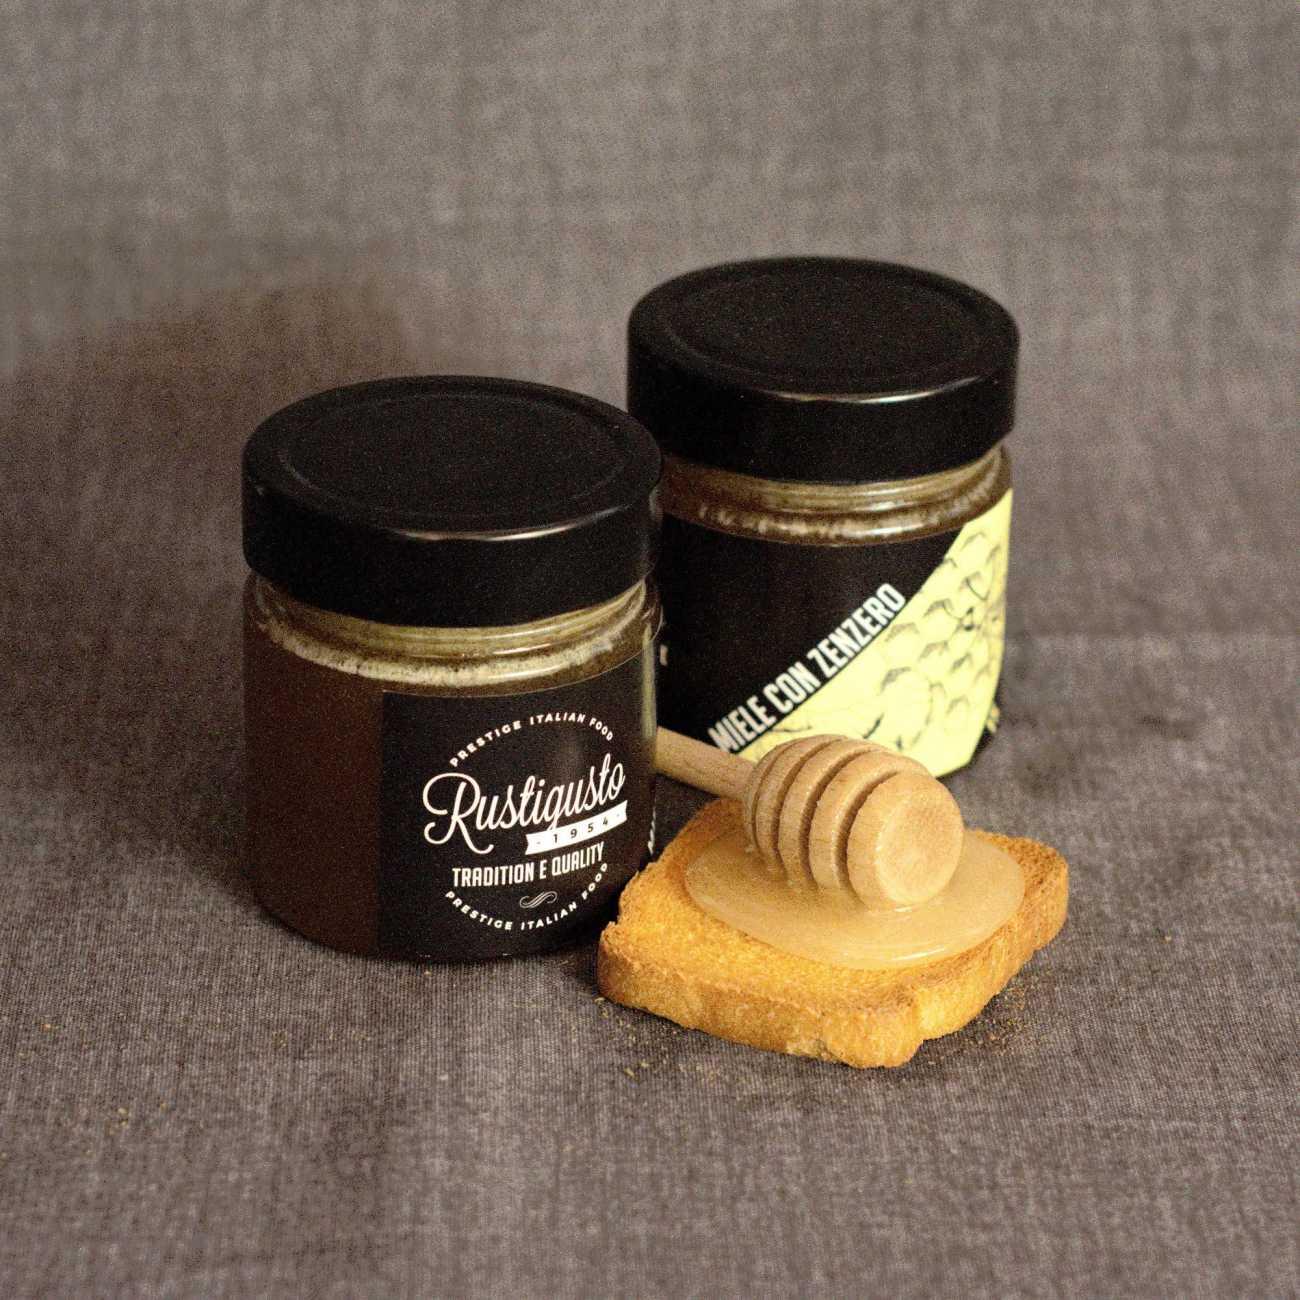 Ginger and acacia honey - Honey